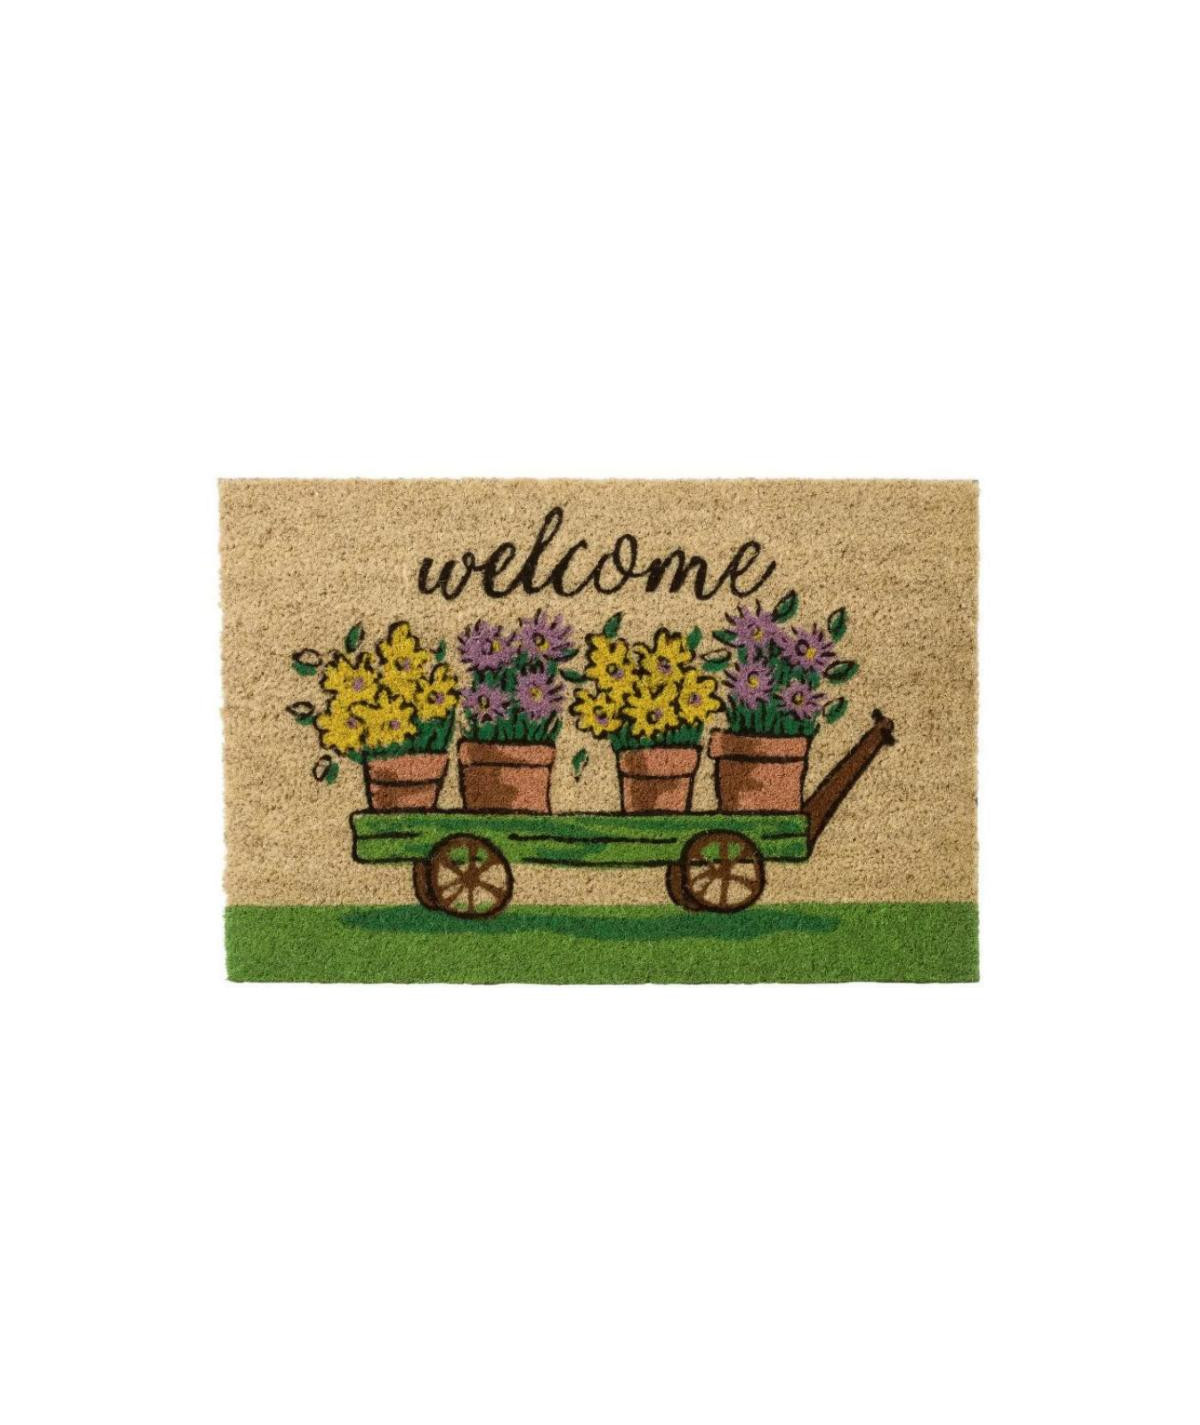 Paillasson coco style jardin 60x40cm - Garden Welcome | Yesdeko